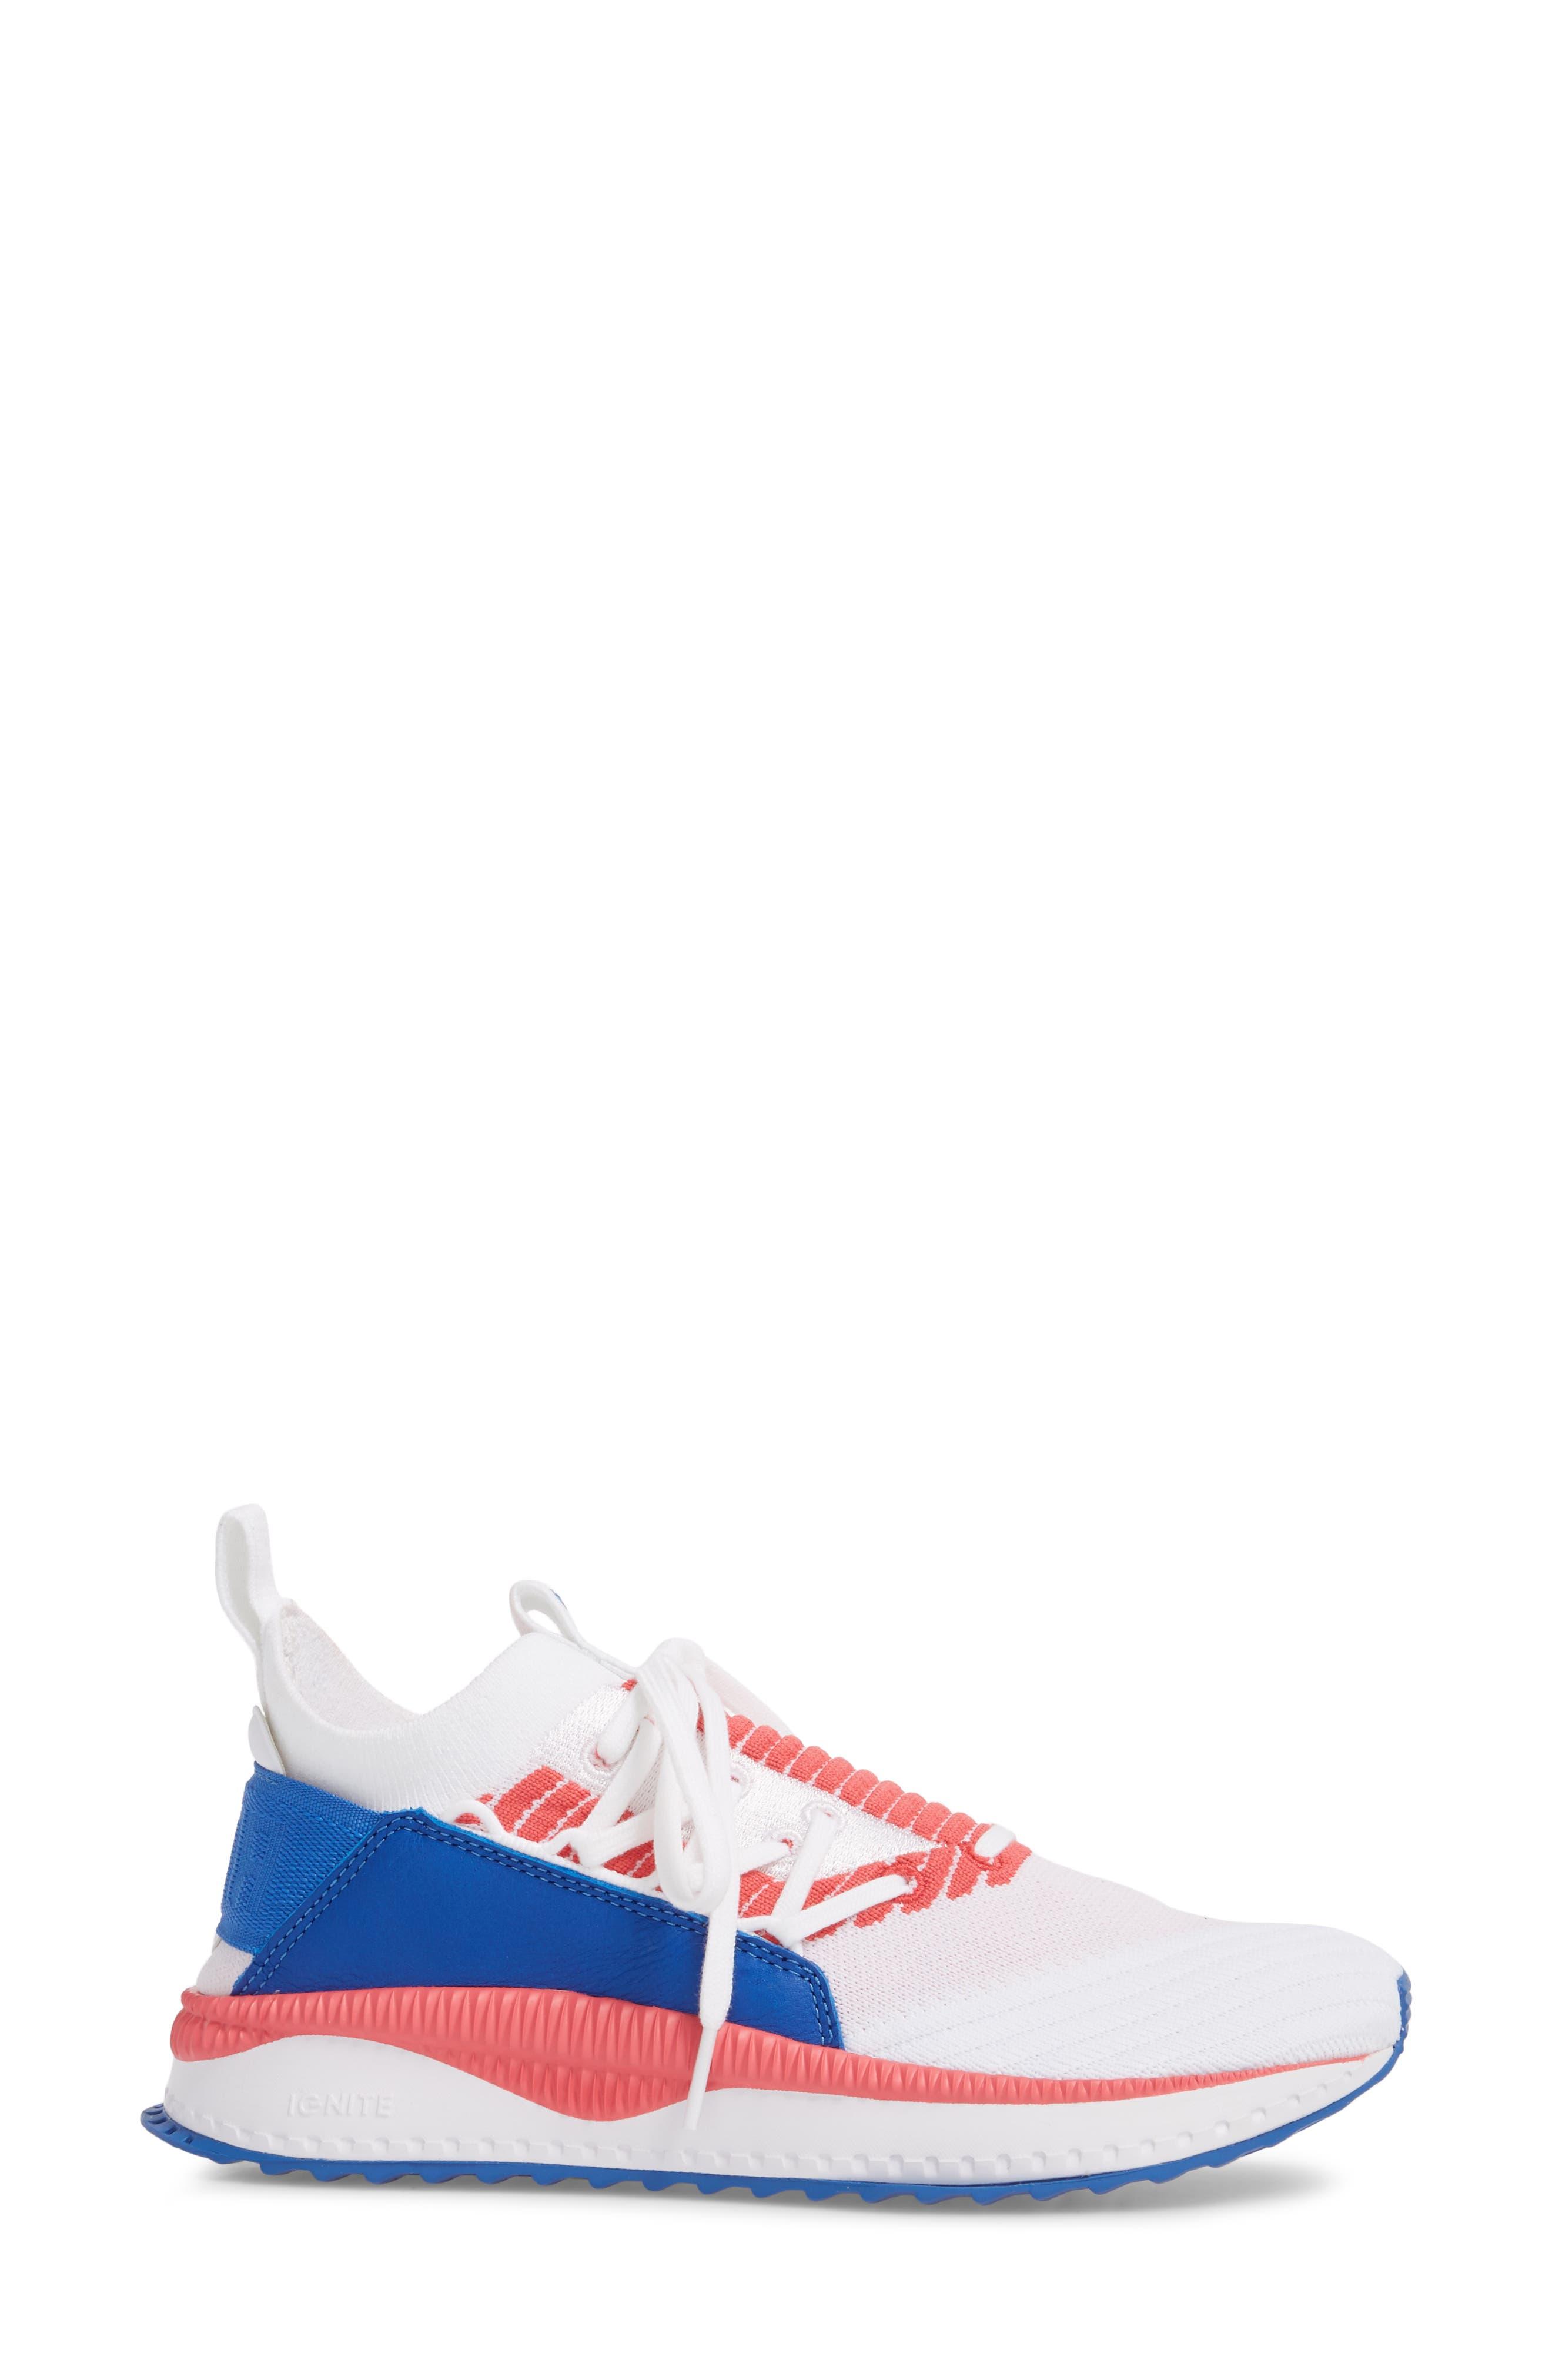 Tsugi Jun Knit Sneaker,                             Alternate thumbnail 20, color,